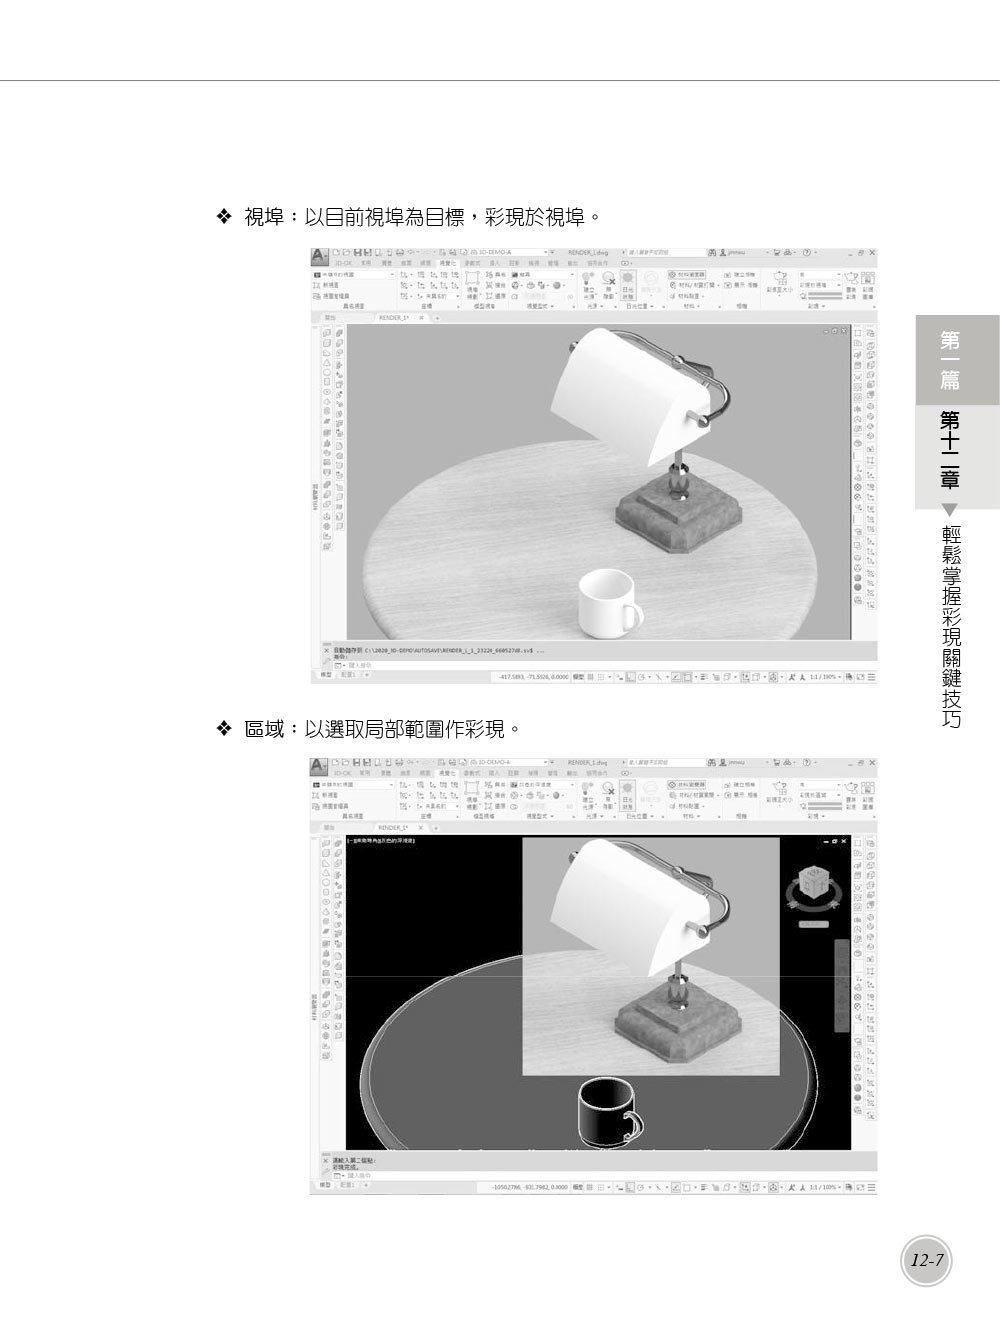 TQC+ AutoCAD 2020 特訓教材 -- 3D應用篇 (隨書附贈23個精彩3D動態教學檔)-preview-7